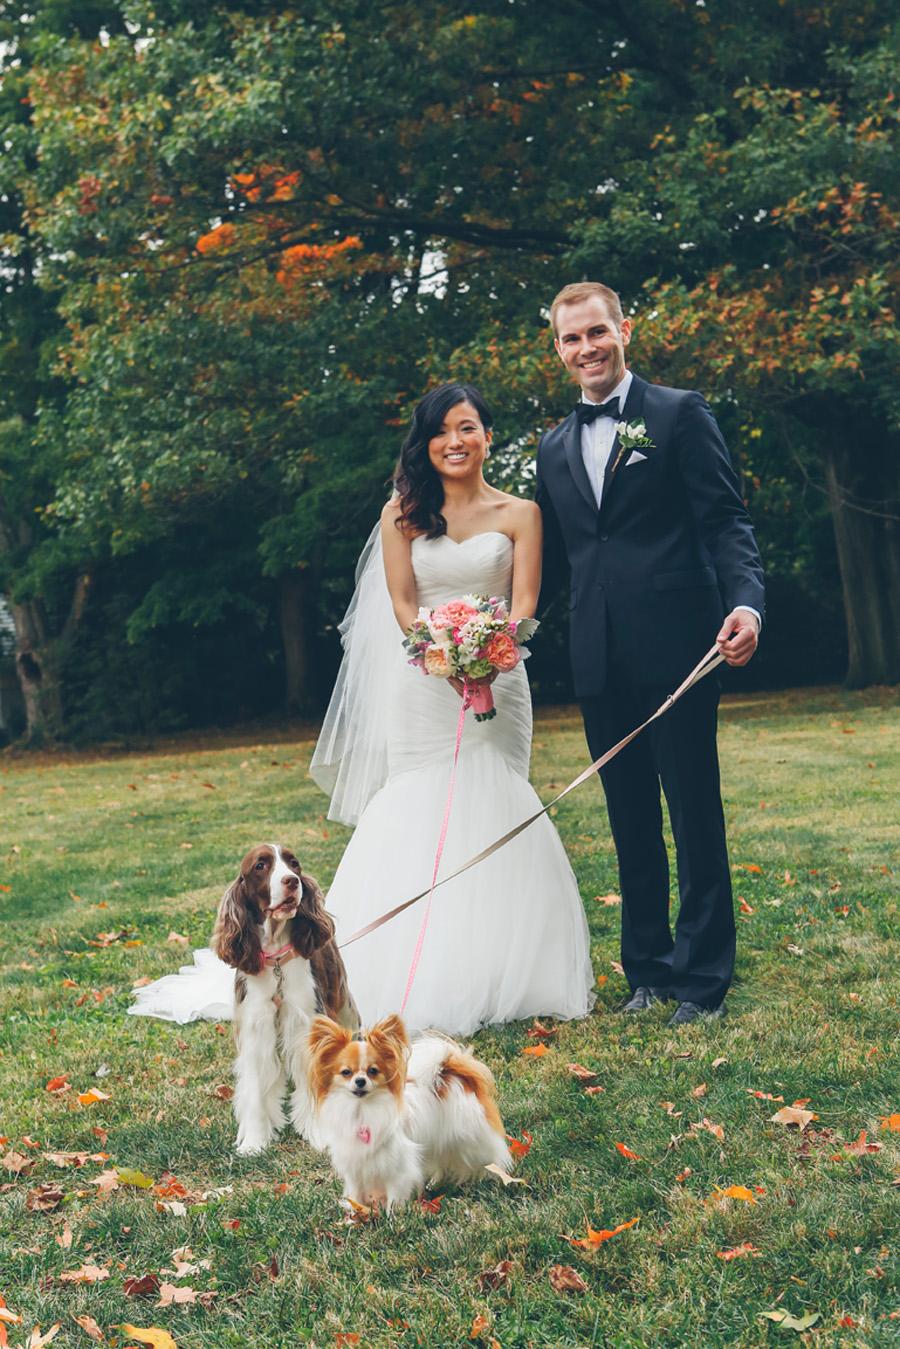 RUTH-BLAKE-WEDDING-PHILADELPHIA-CYNTHIACHUNG-BLOG-0024